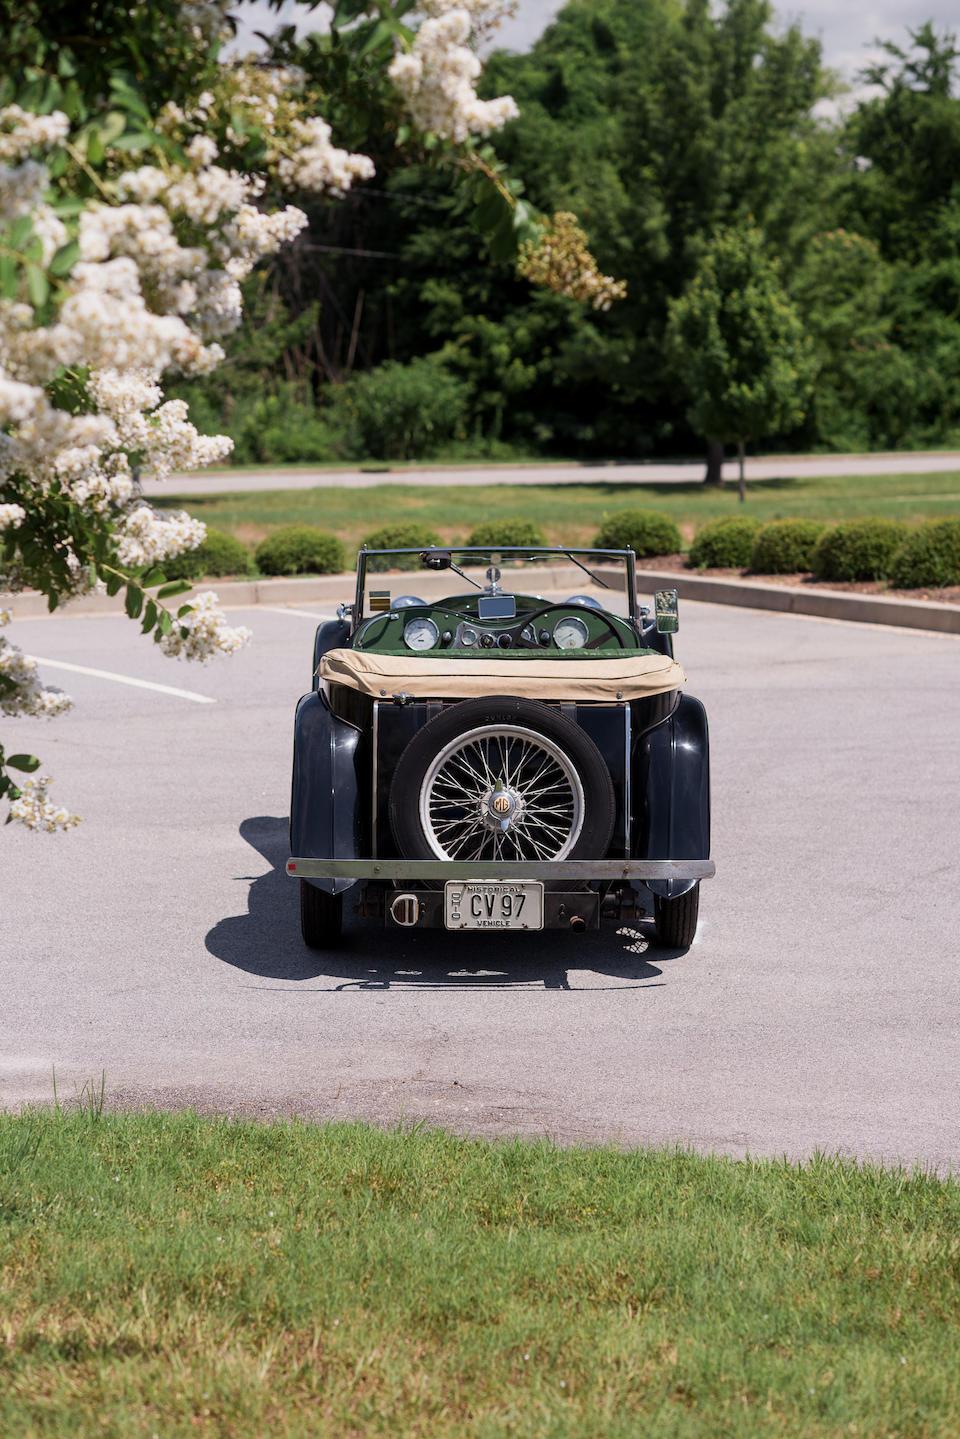 <b>1948 MG TC Midget</b><br />Chassis no. TC/5112<br />Engine no. XPAG 5733